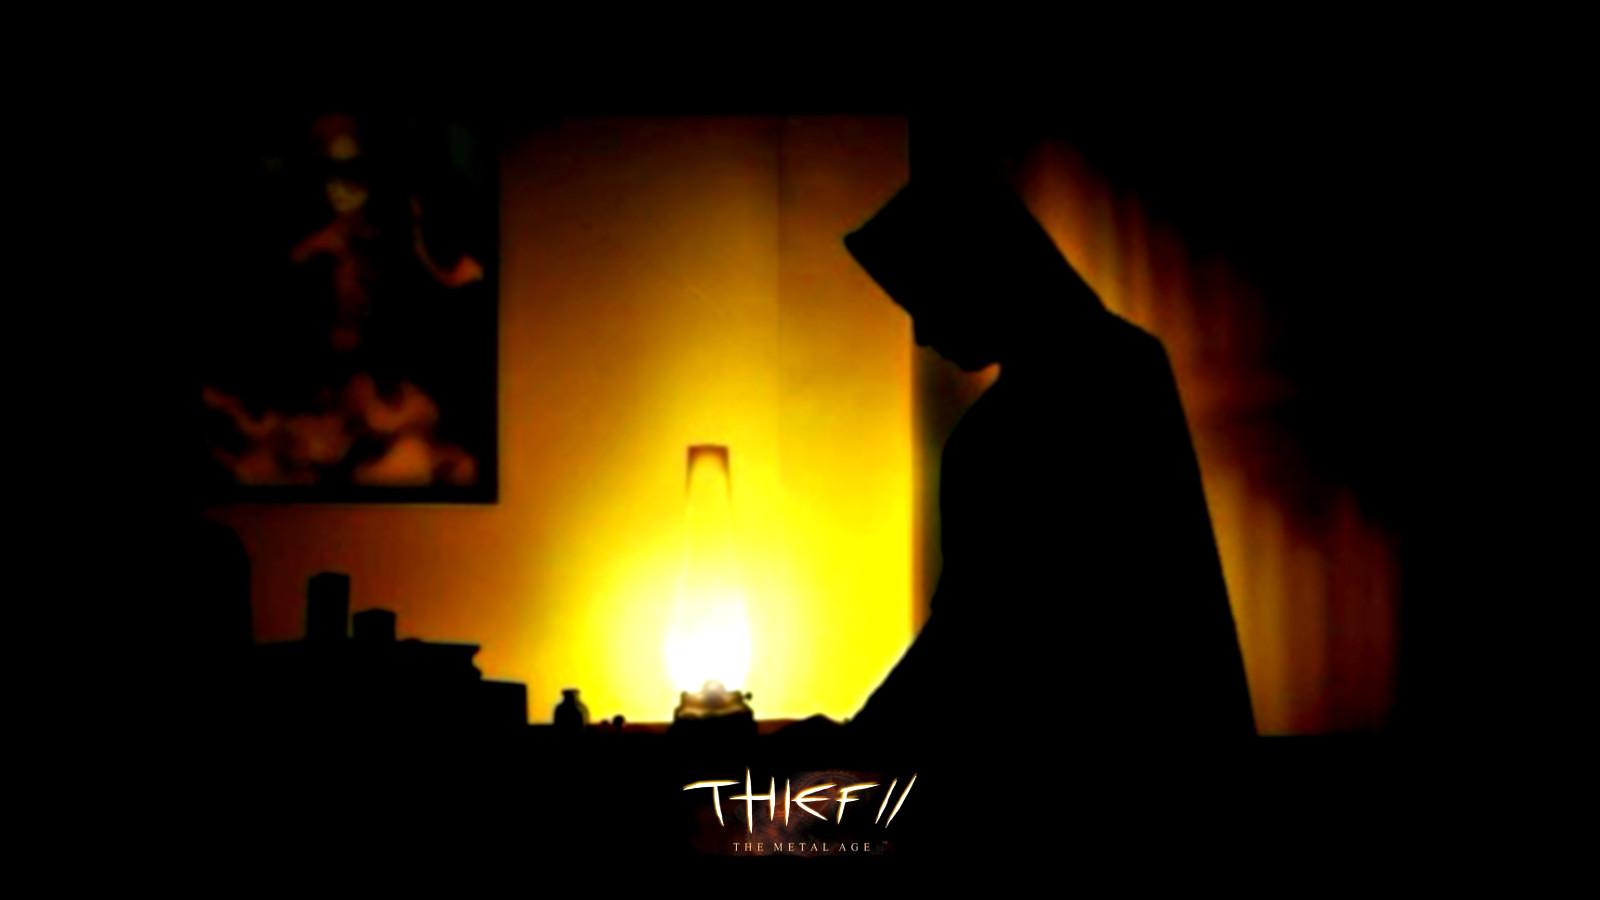 Thief wallpaper 4 by KeeperHattori 1600x900